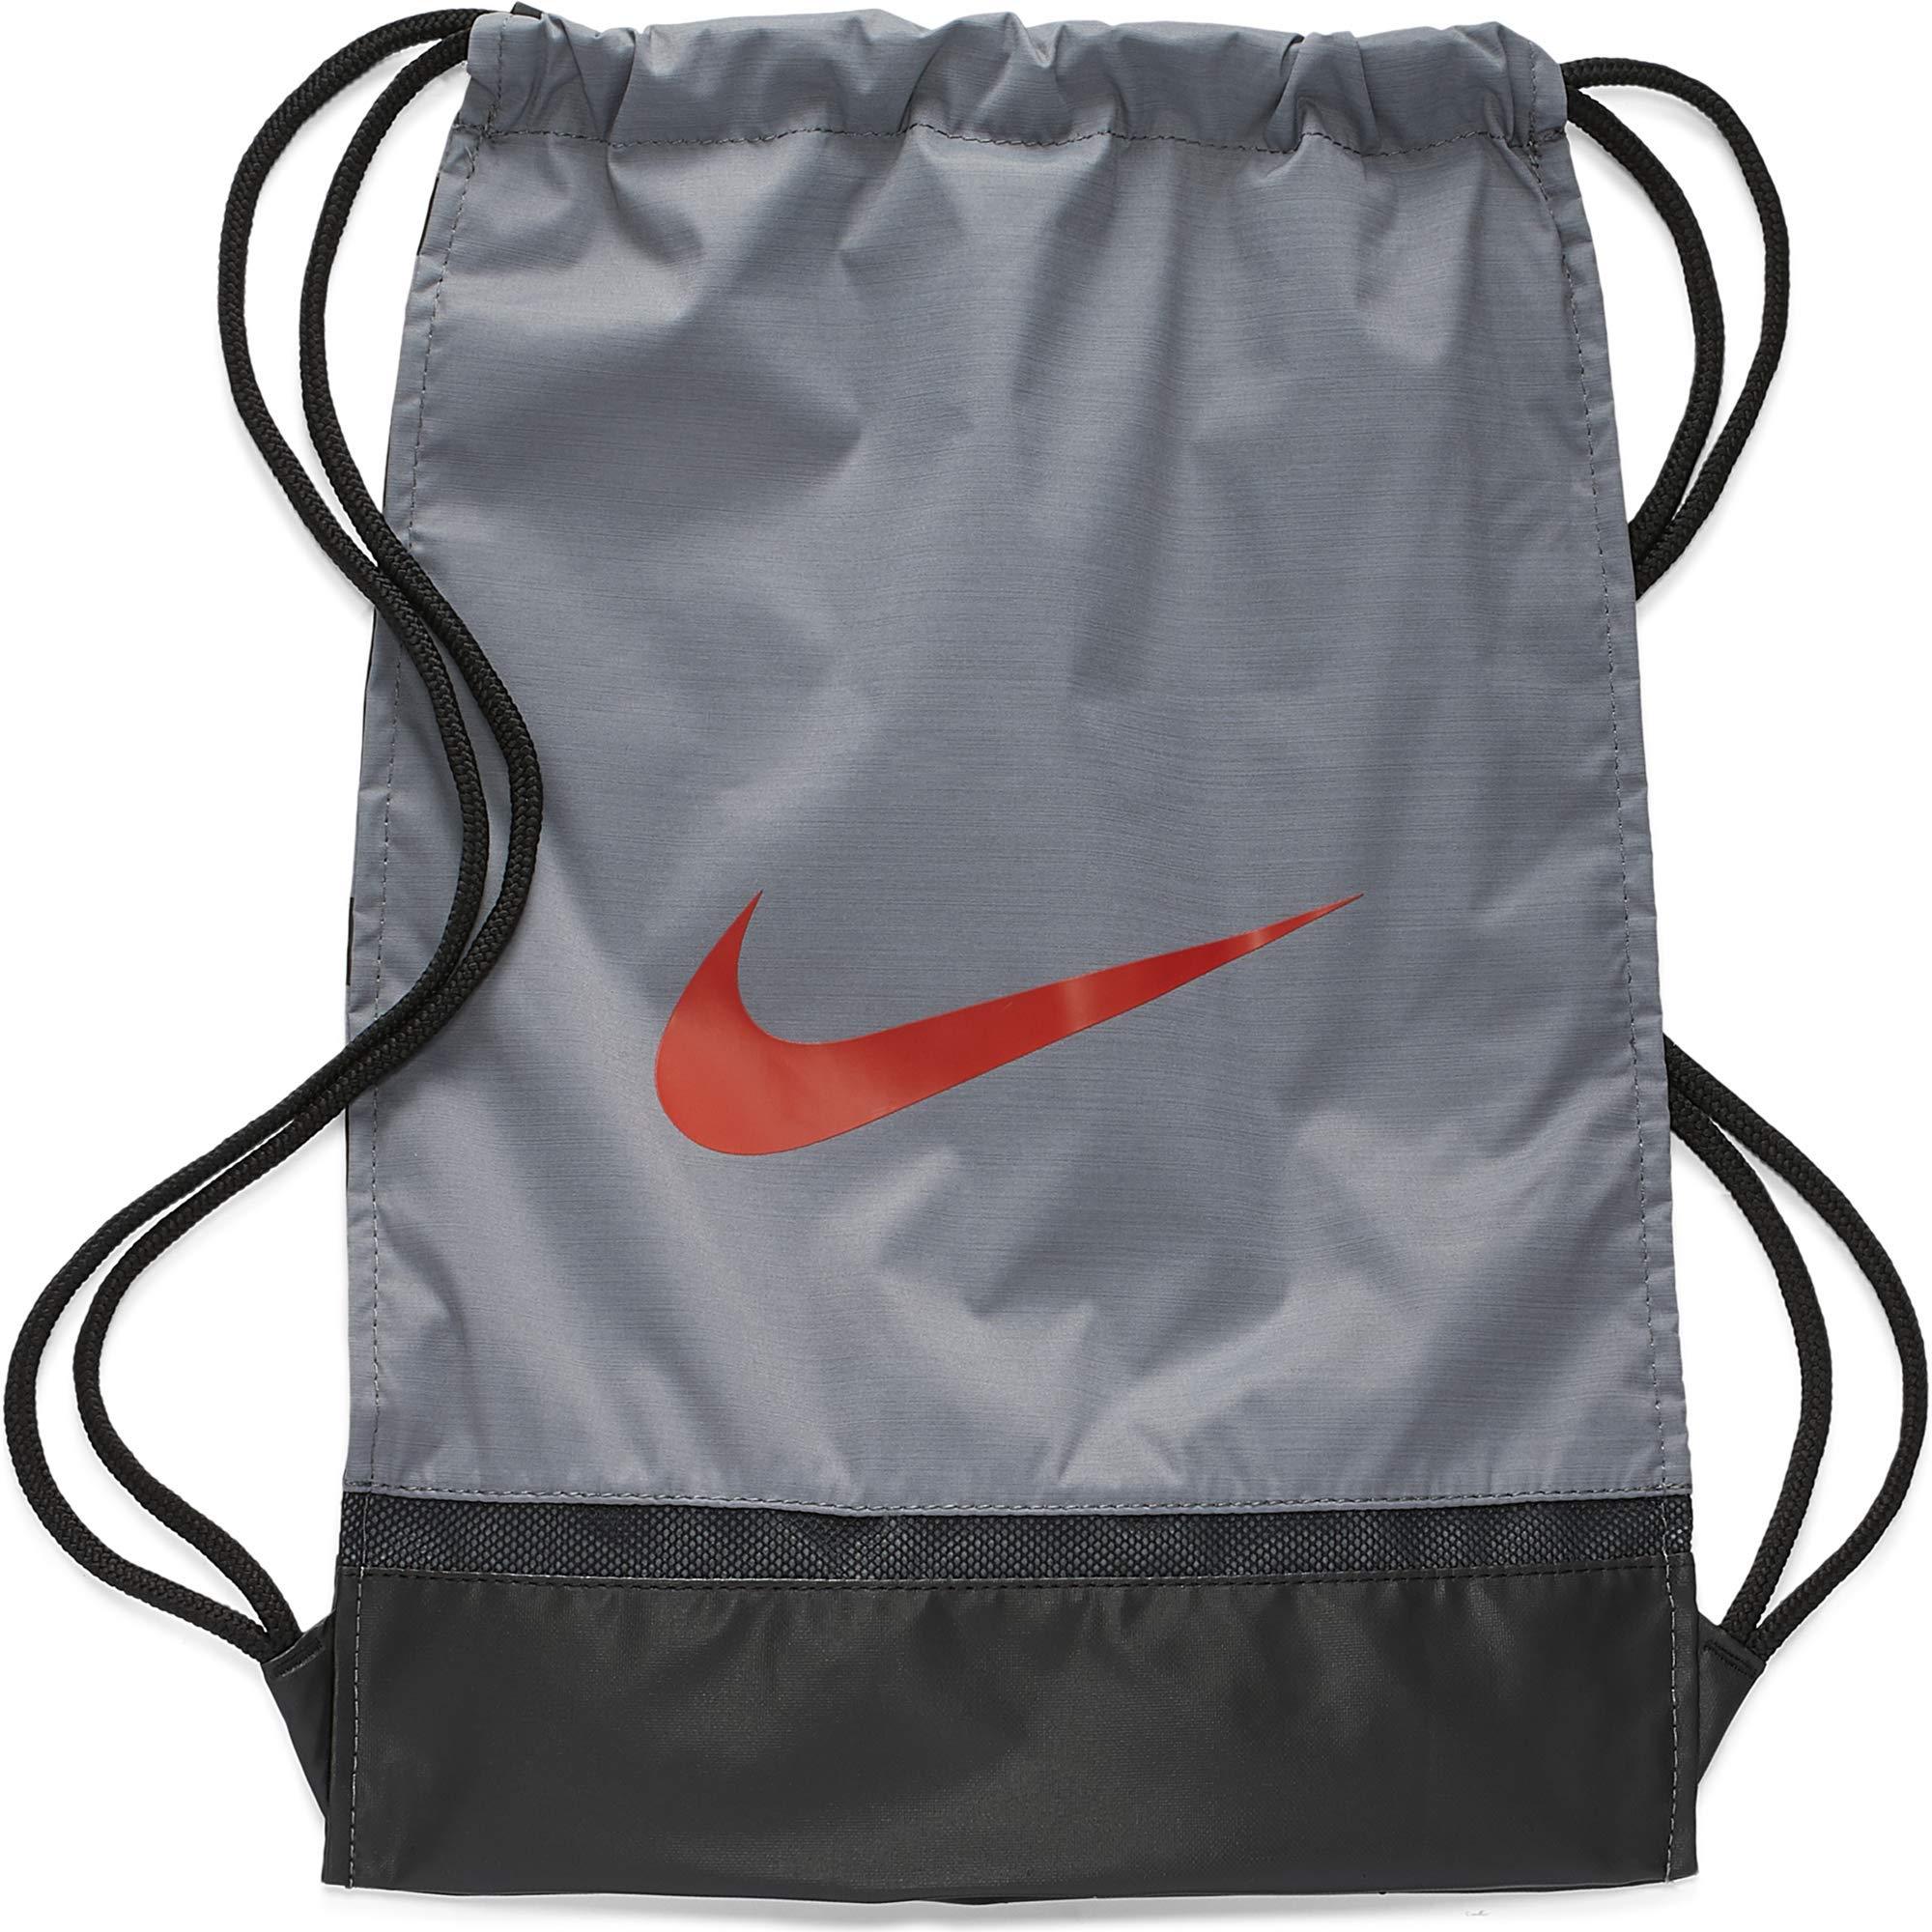 cascada Él innovación  Nike Brasilia Training Gymsack- Buy Online in Bahamas at Desertcart